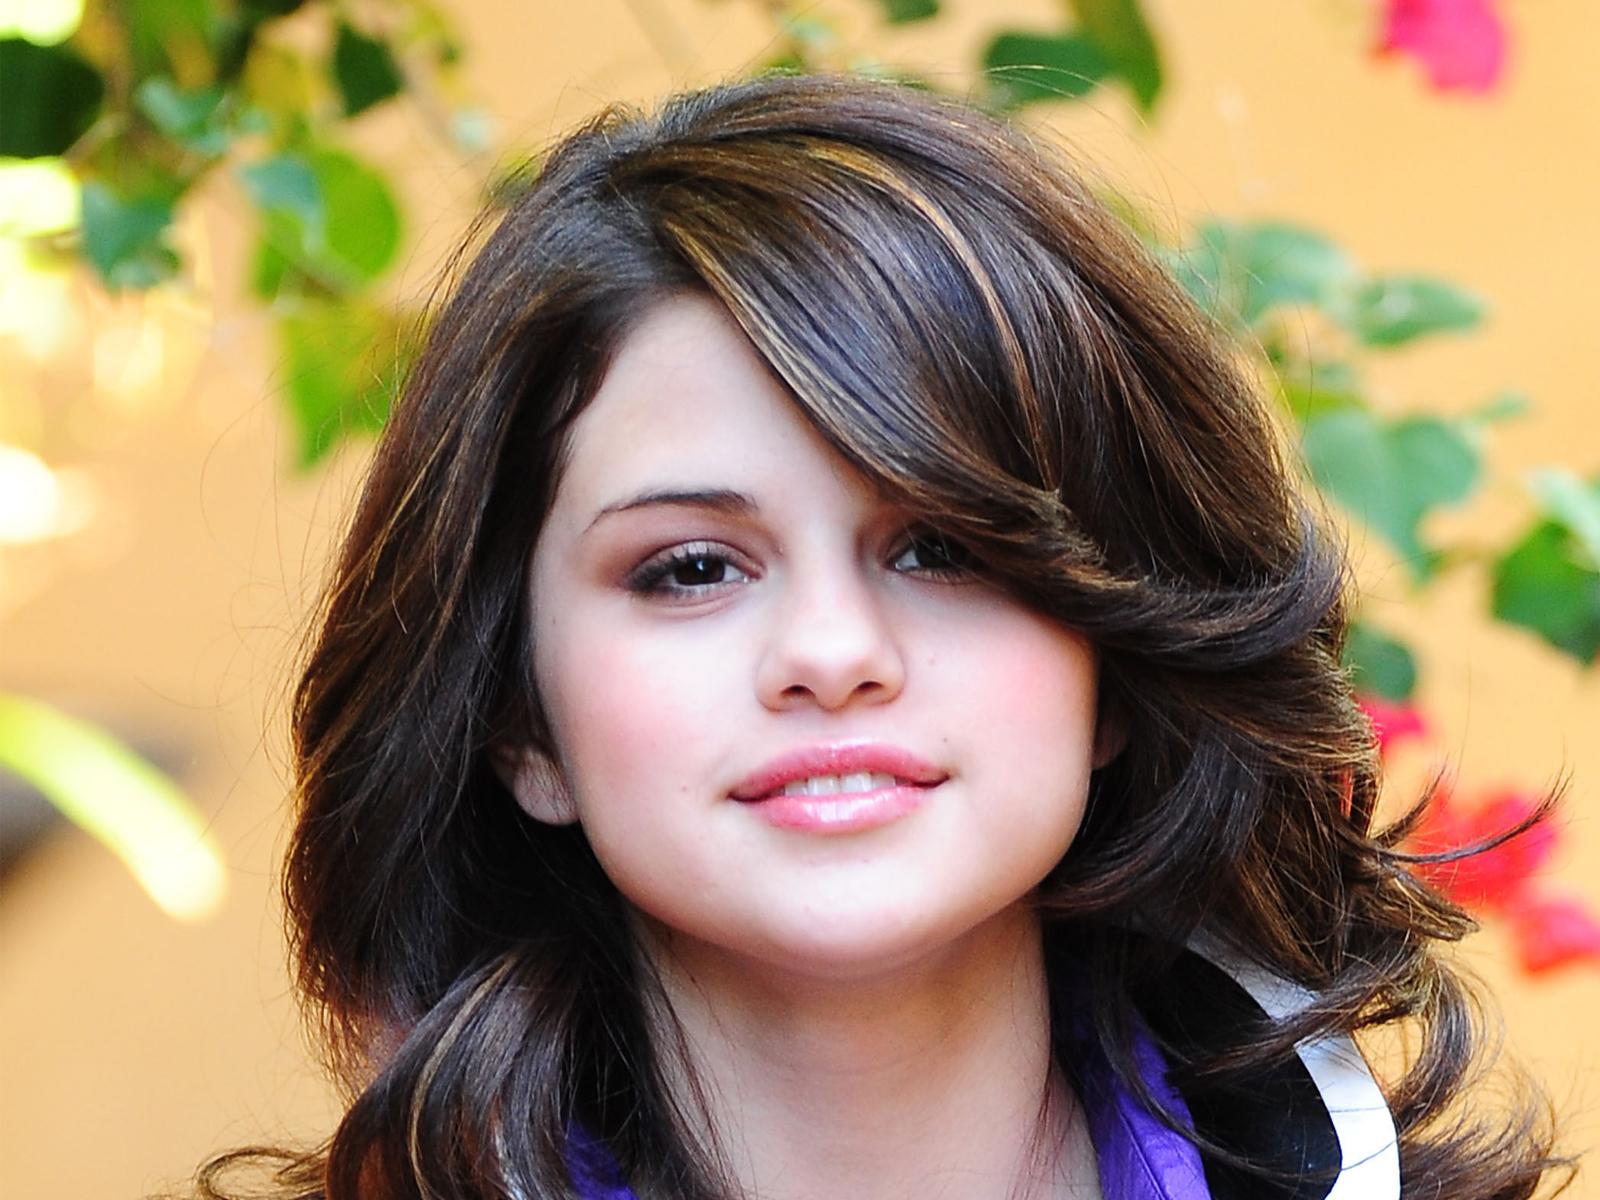 Hd Wallpapers Selena Gomez Desktop